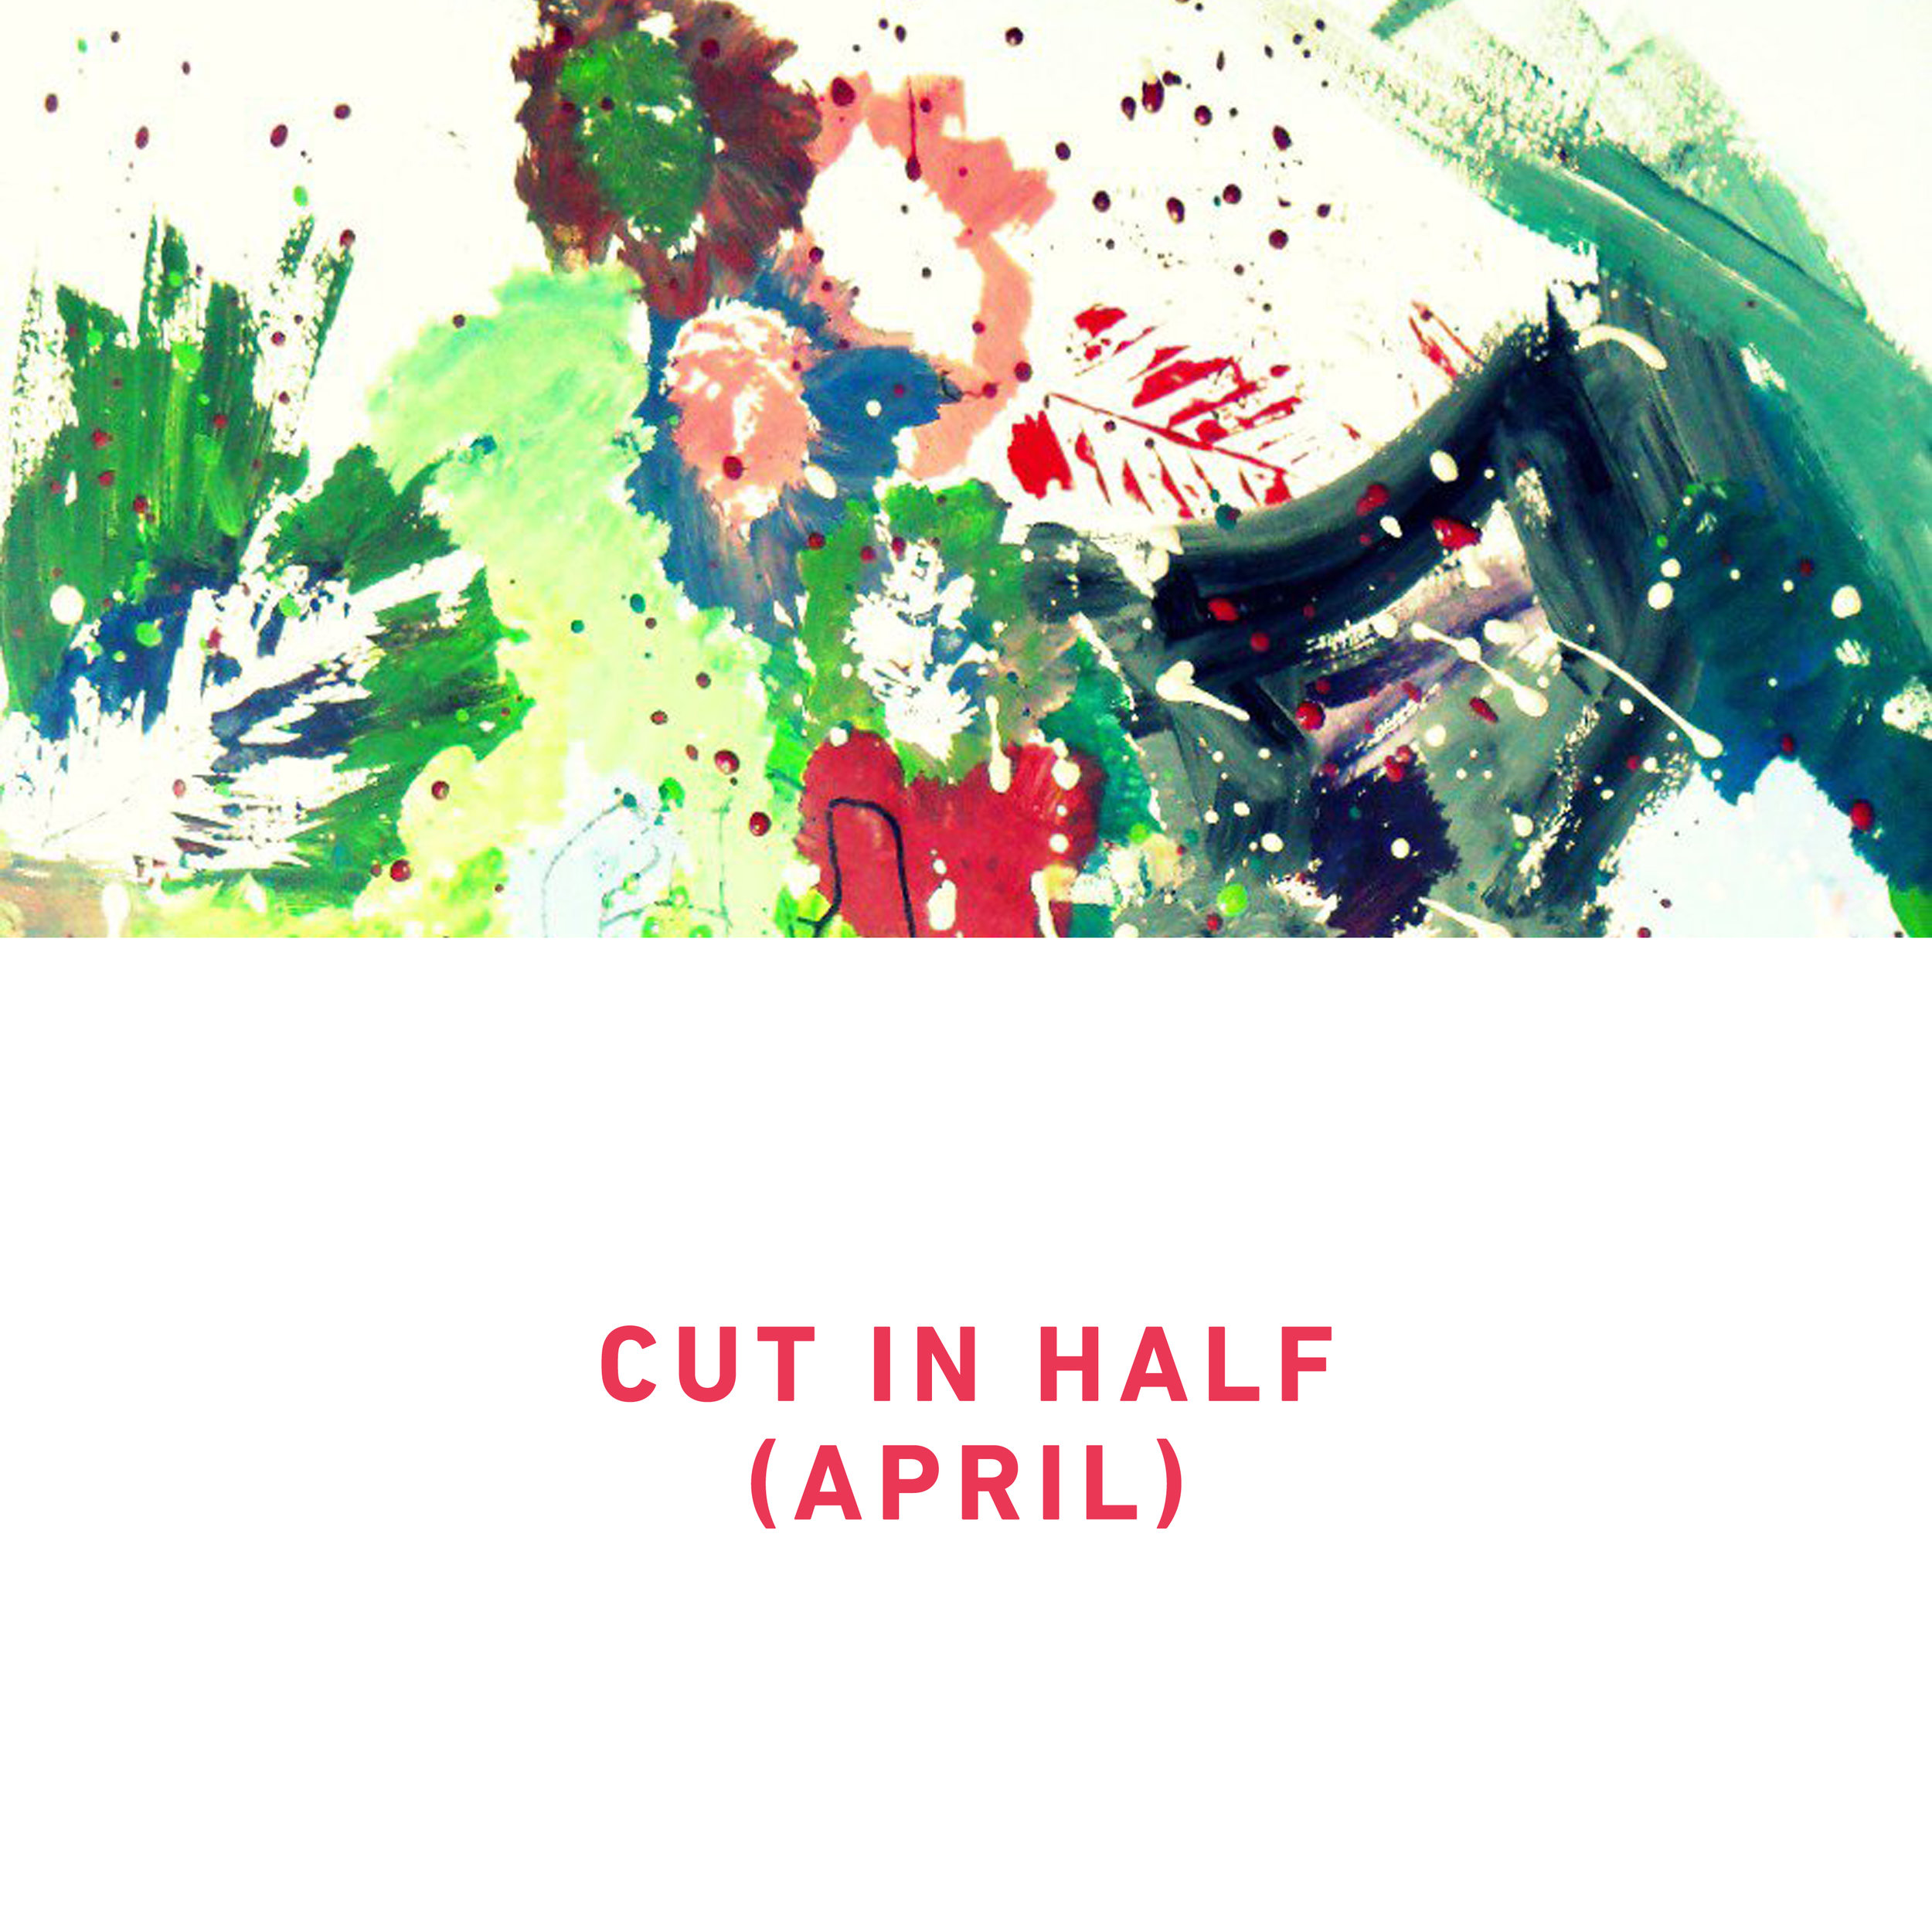 Cut In Half (April)